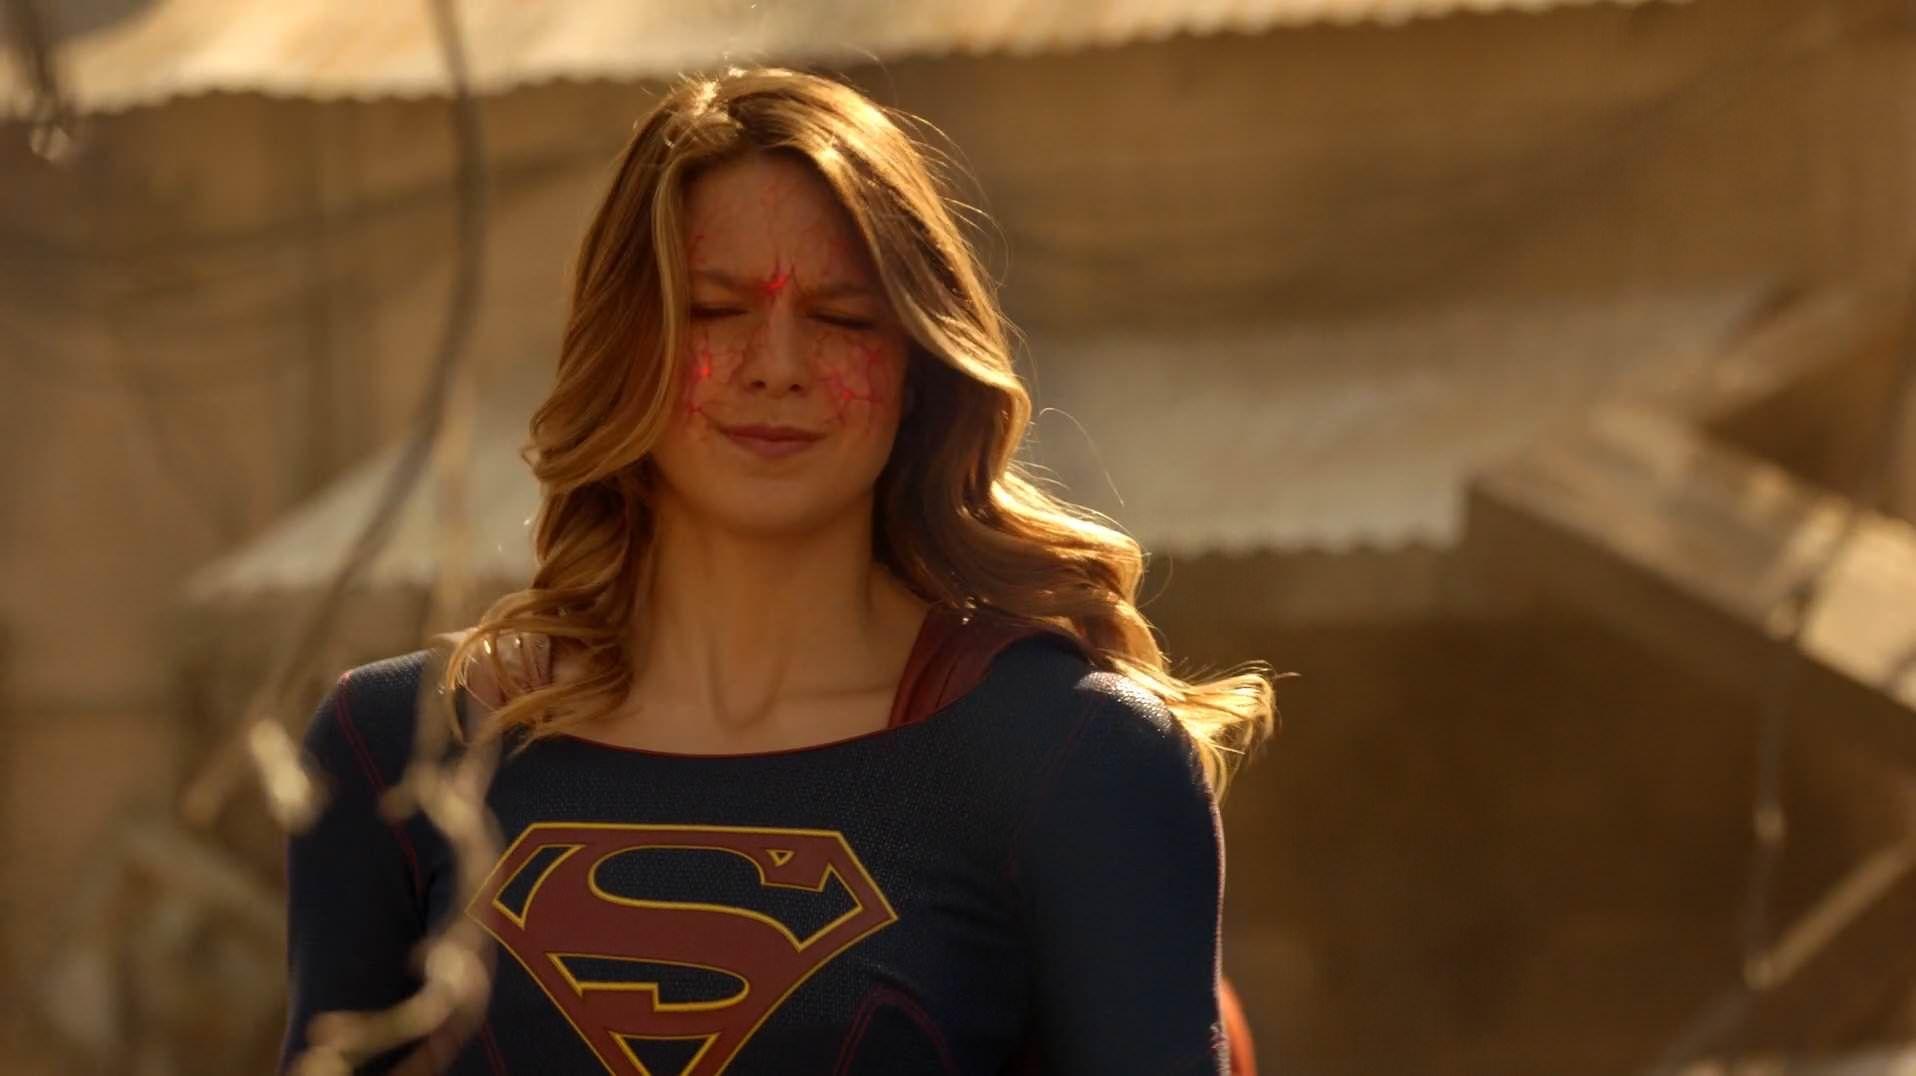 1.16 Falling - spg116 0440 - Supergirl Gallery & Screencaps